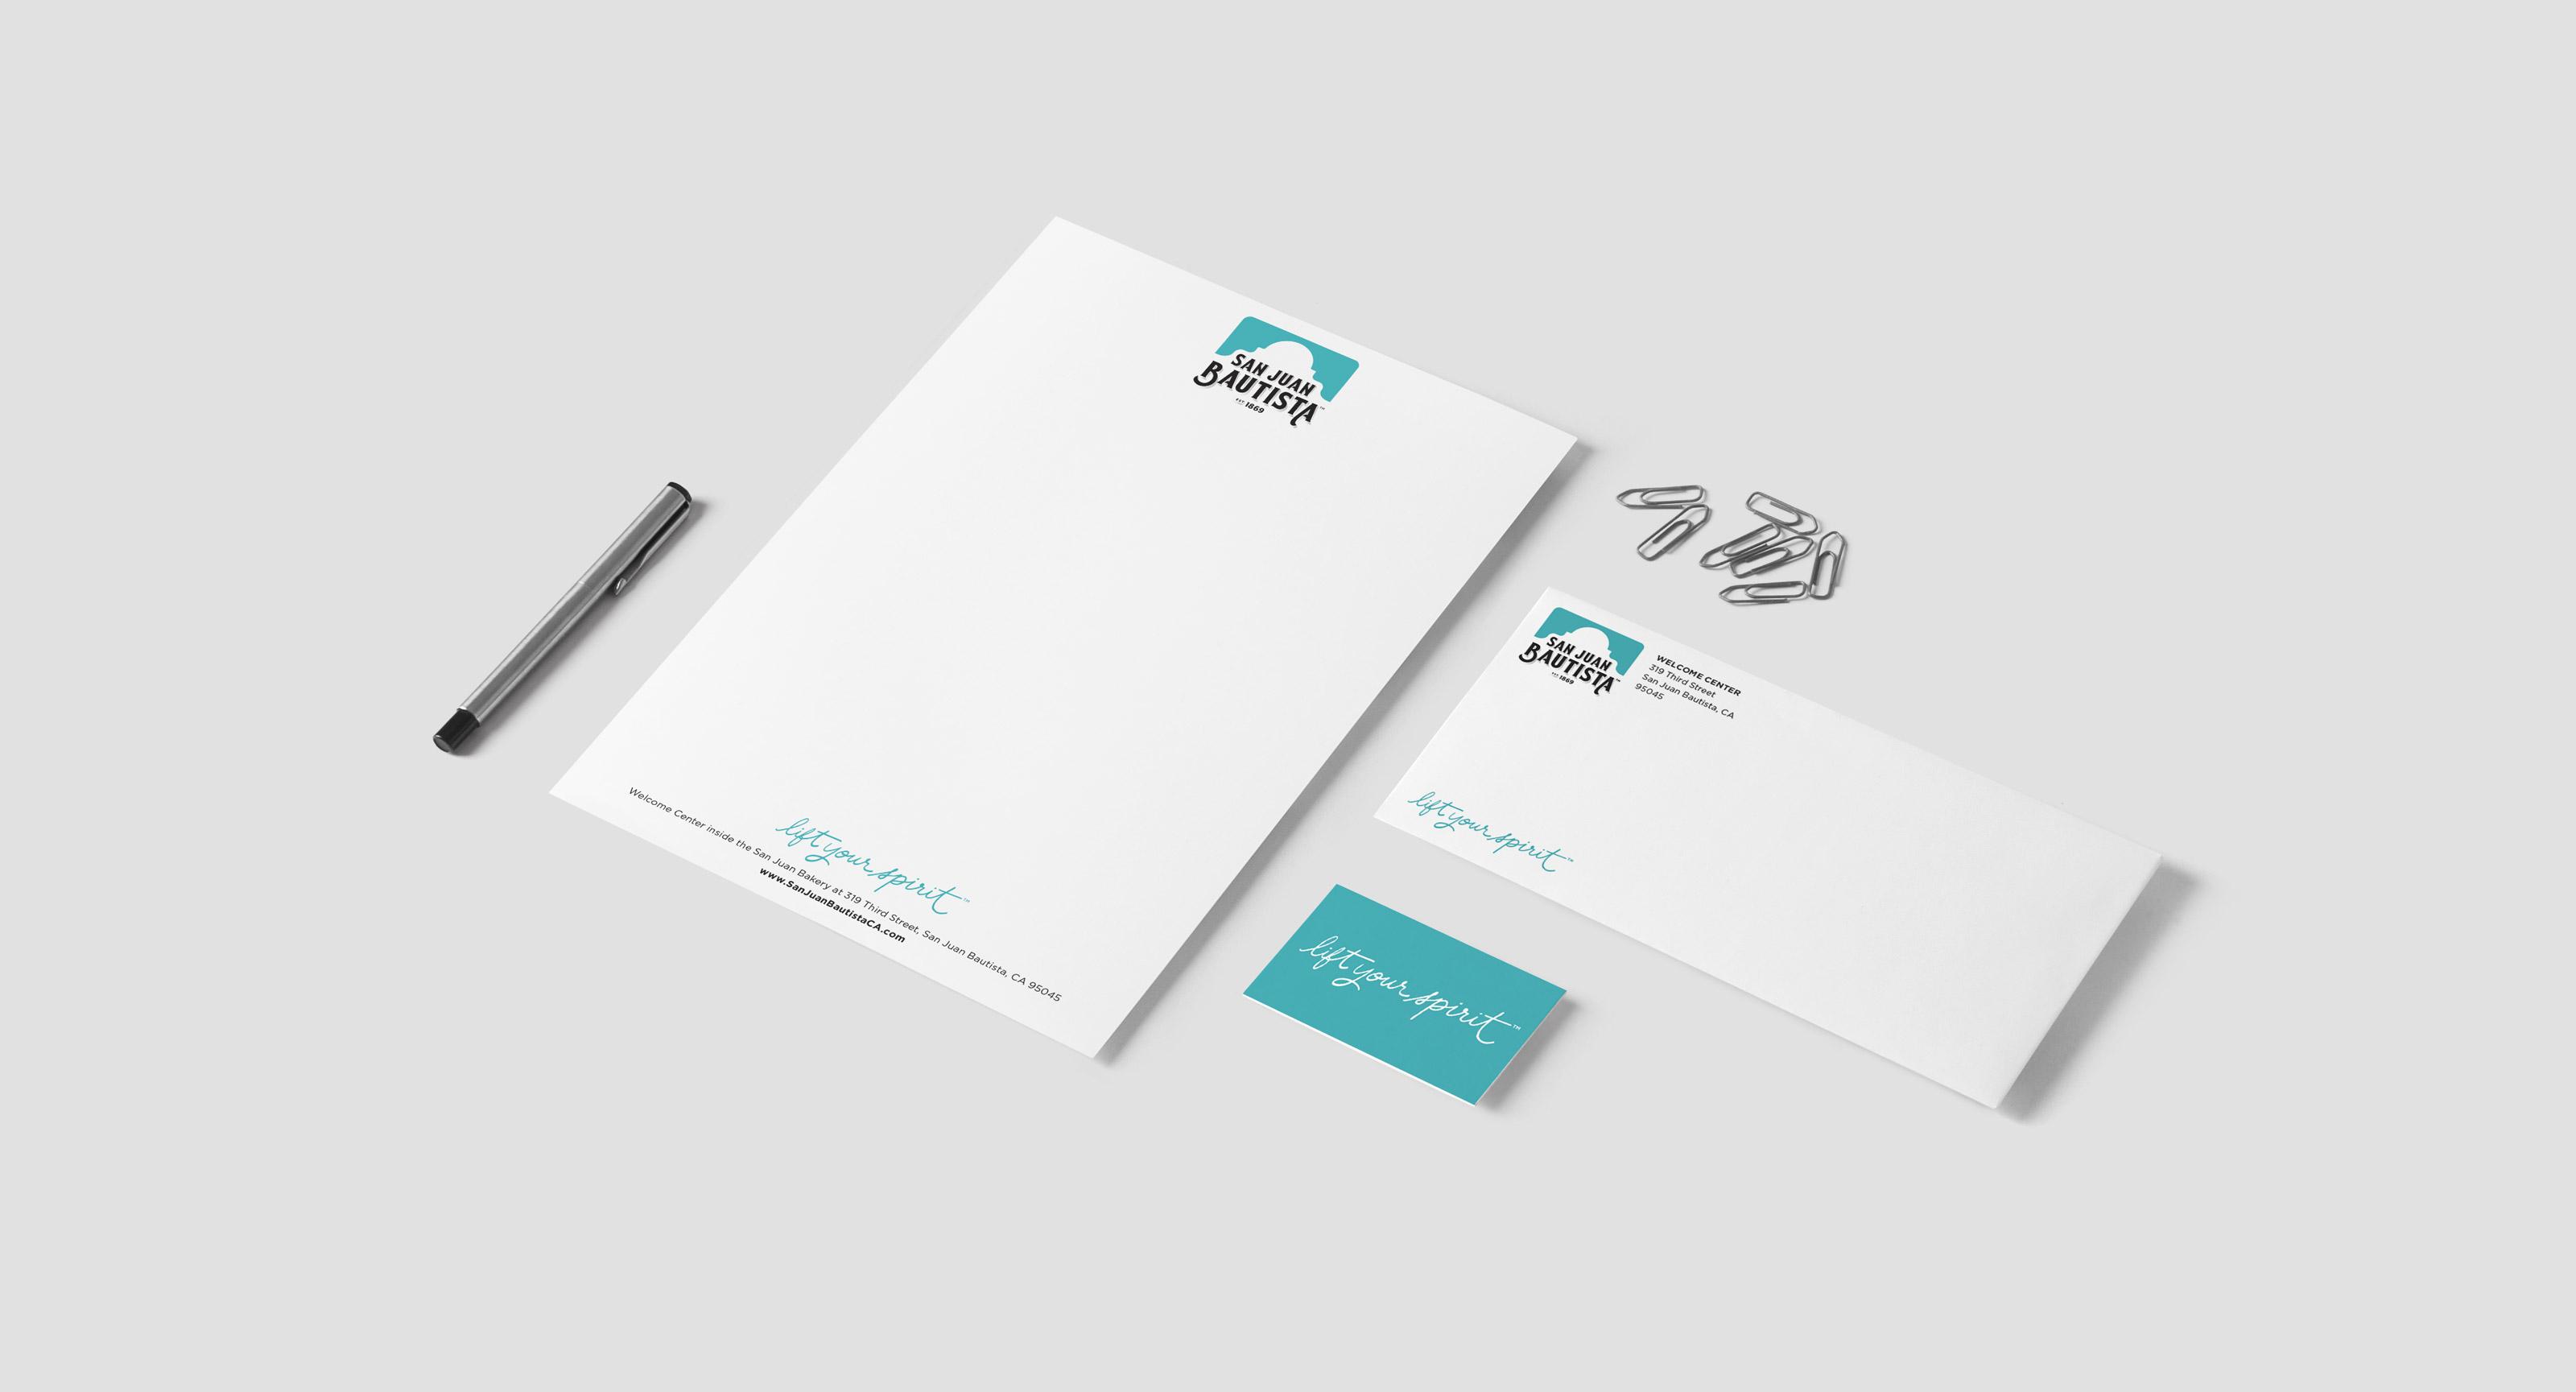 San Juan Bautista Stationary: Letterhead, Business Card